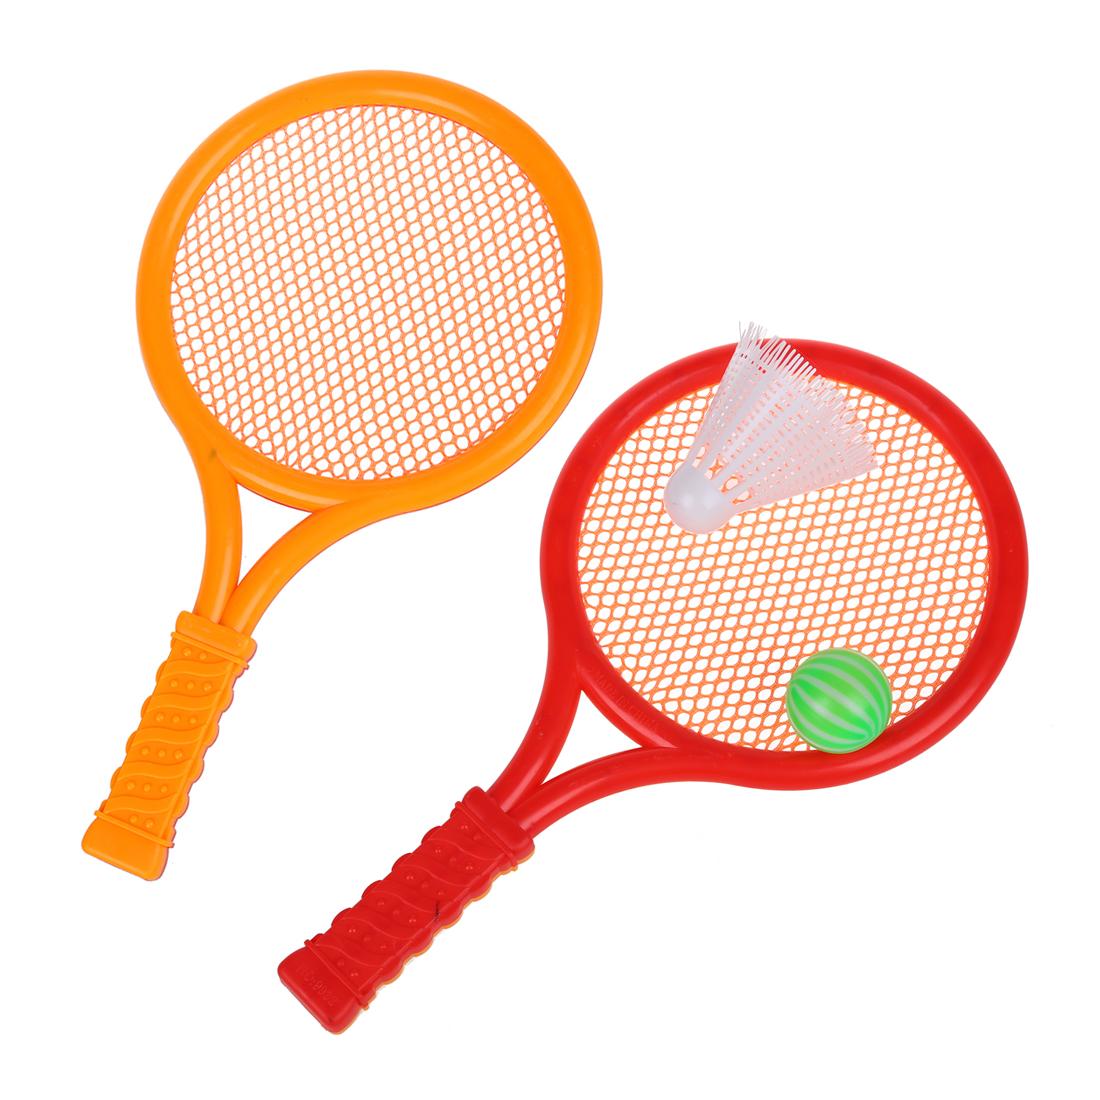 Kinder Spiel Orange Rote Plastik Tennis Badminton Schlaeger Spielzeug Set H D2F8